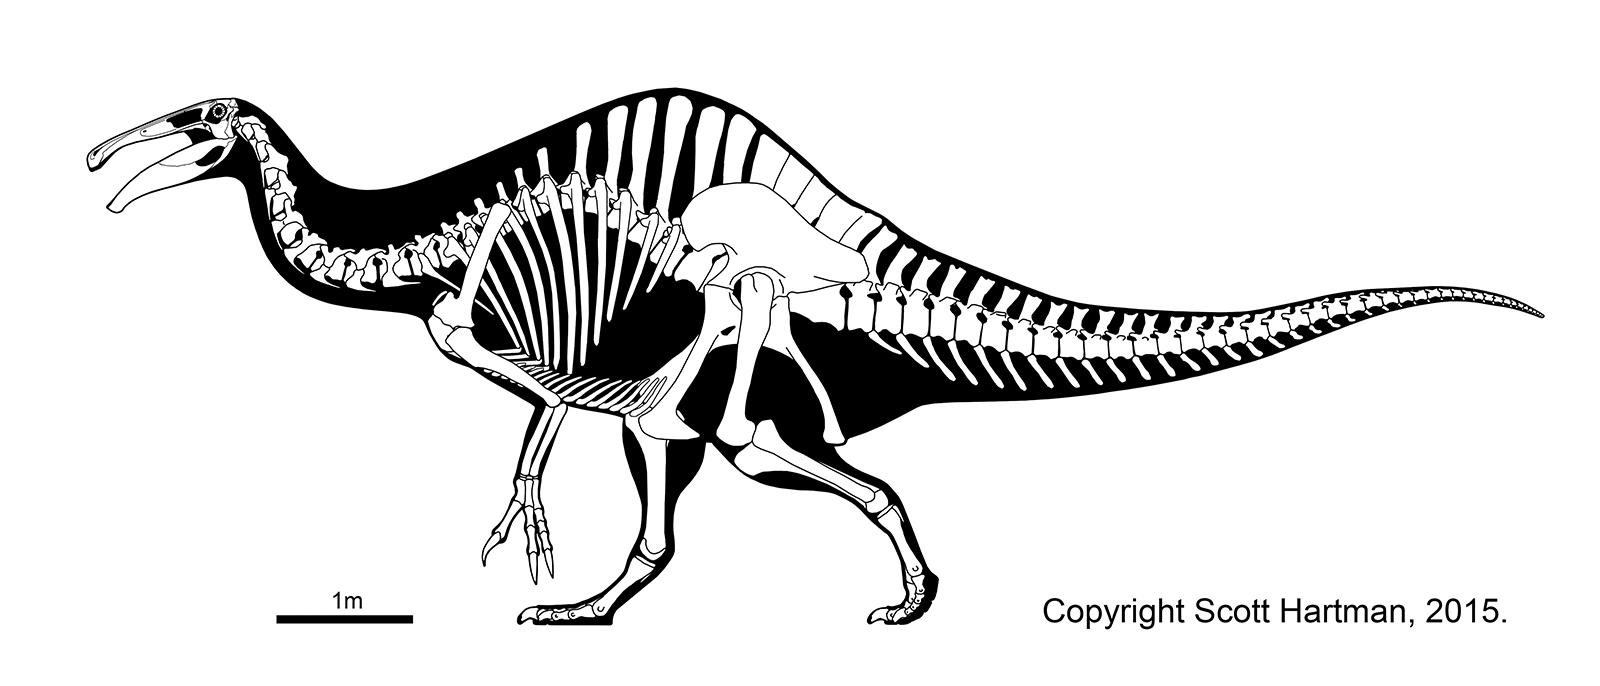 Deinocheirus skeletal